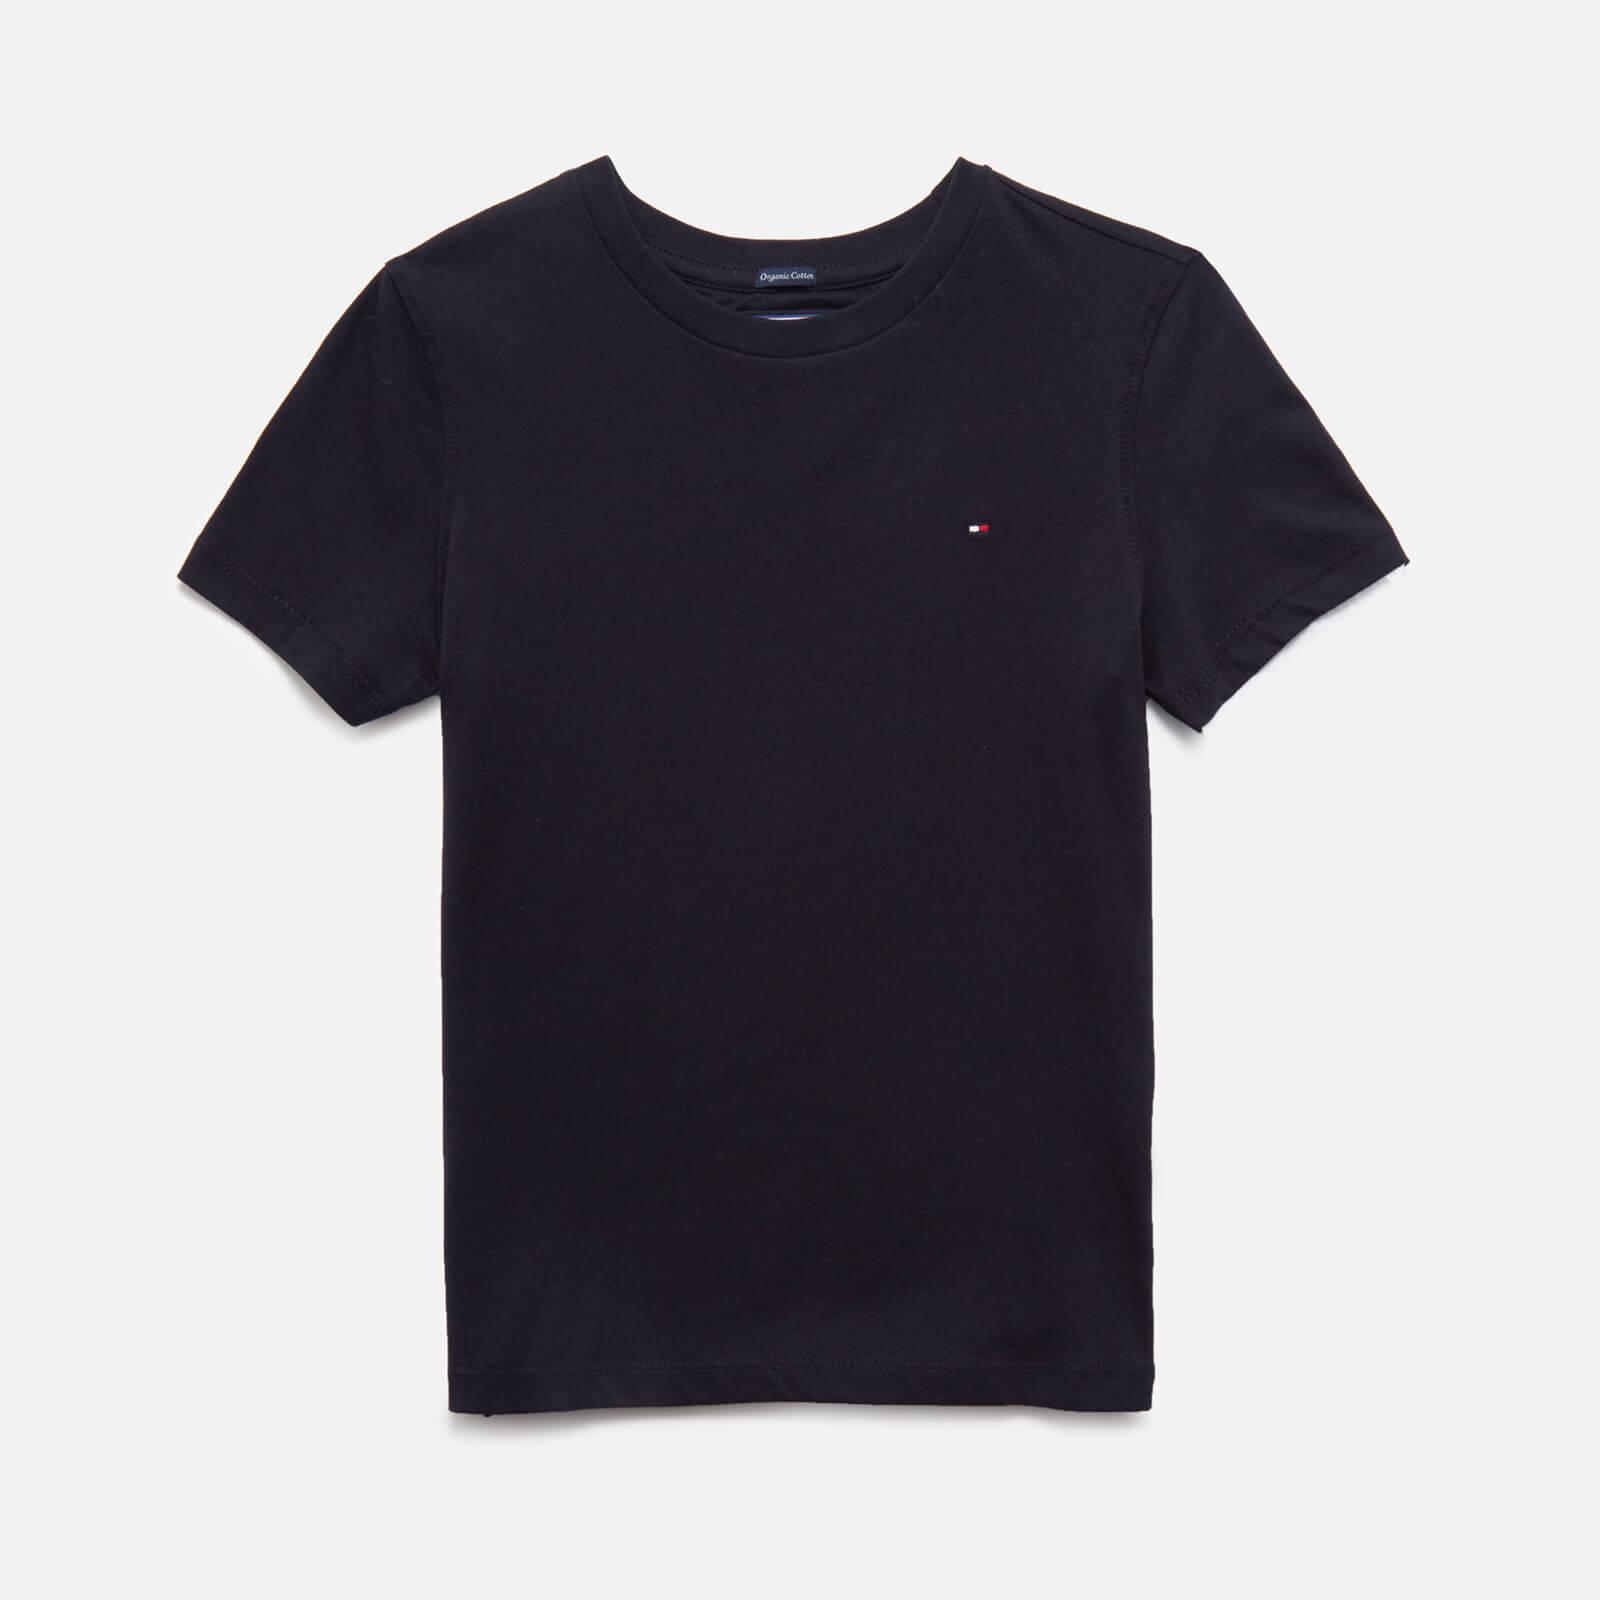 Tommy Kids Boys' Short Sleeve T-Shirt - Sky Captain - 8 Years